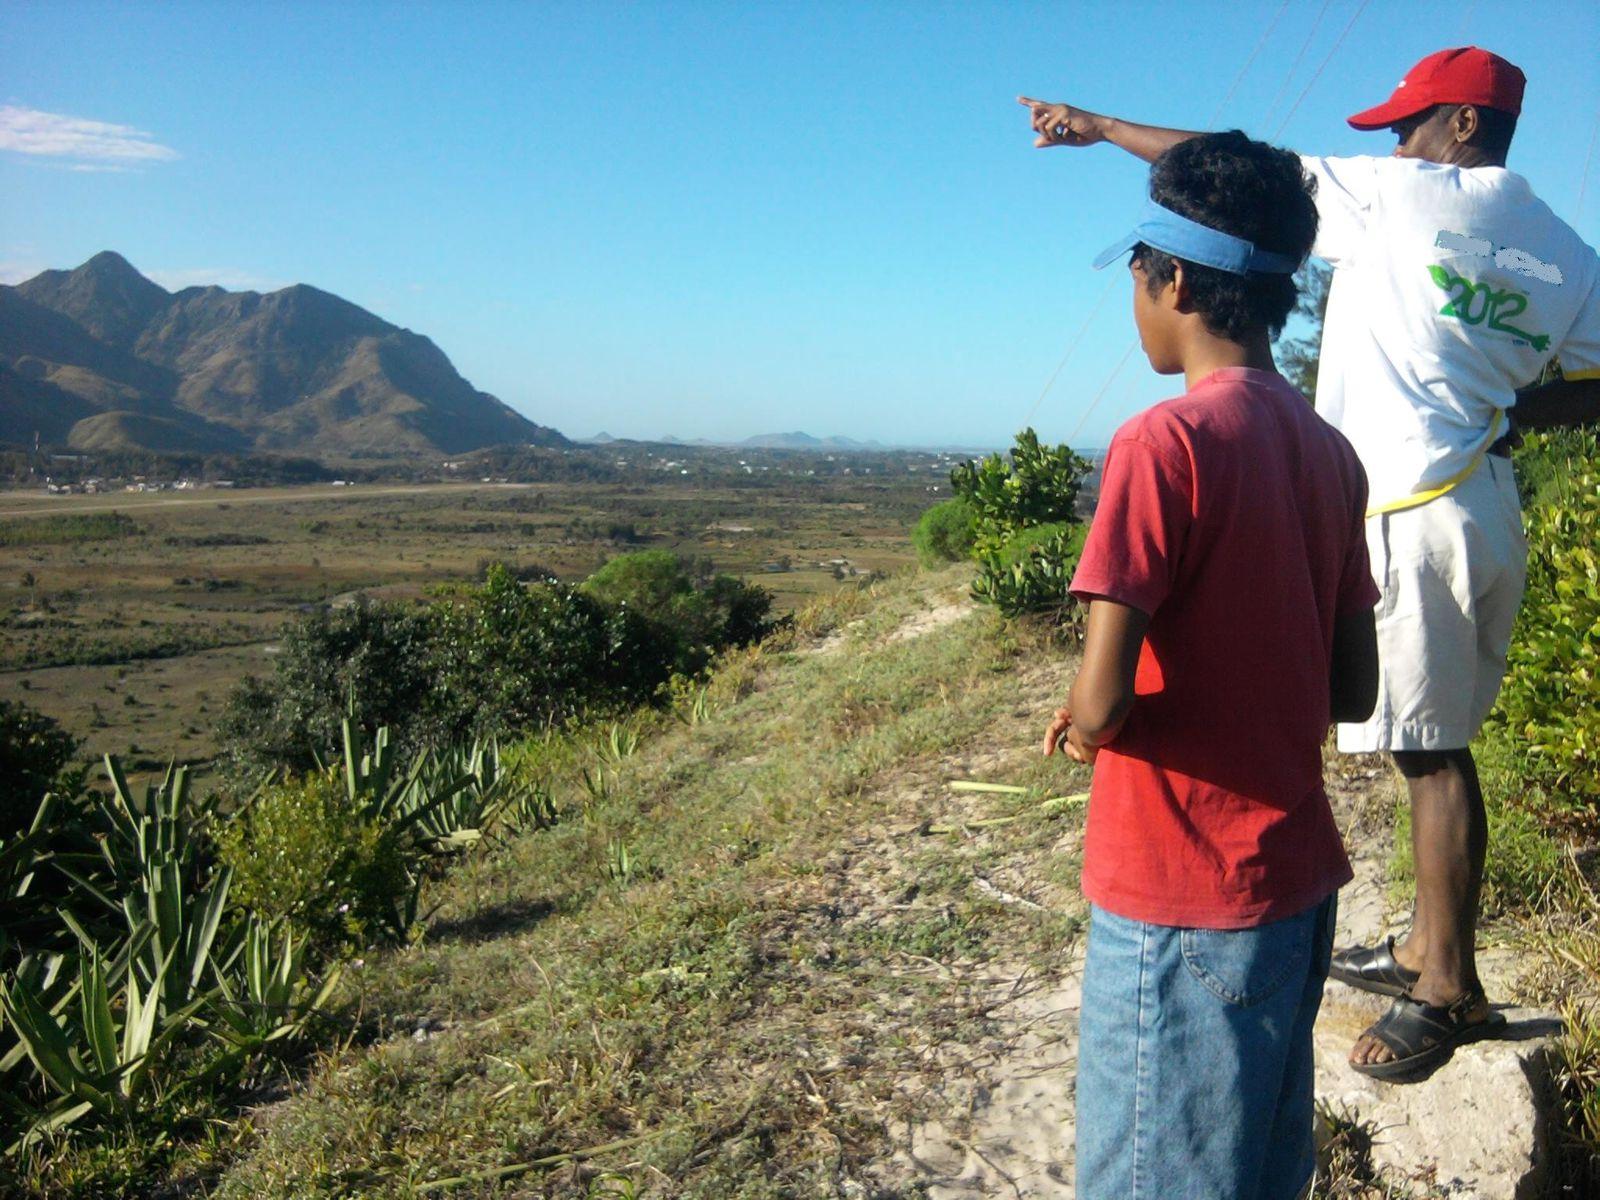 Madagasar, eny ambony eny - de part les hauteurs